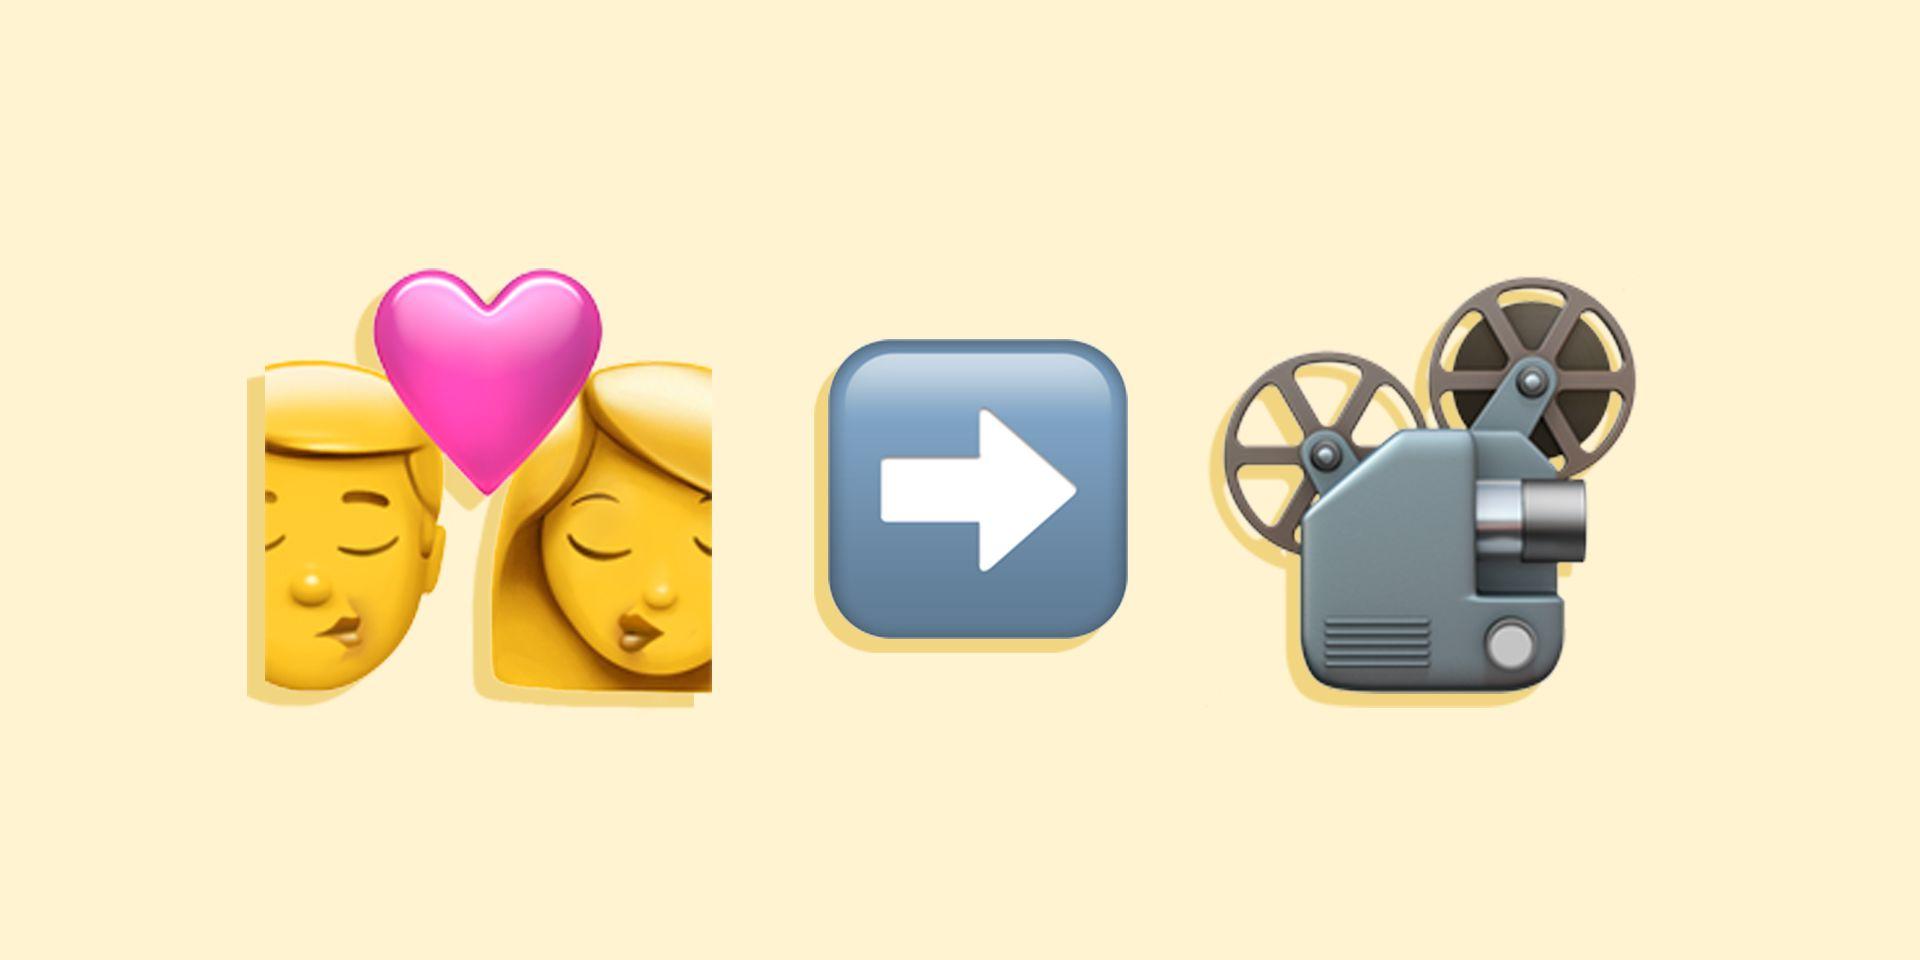 Sex Emoji Combinations - 12 Emoji Combos to Send to Your Crush